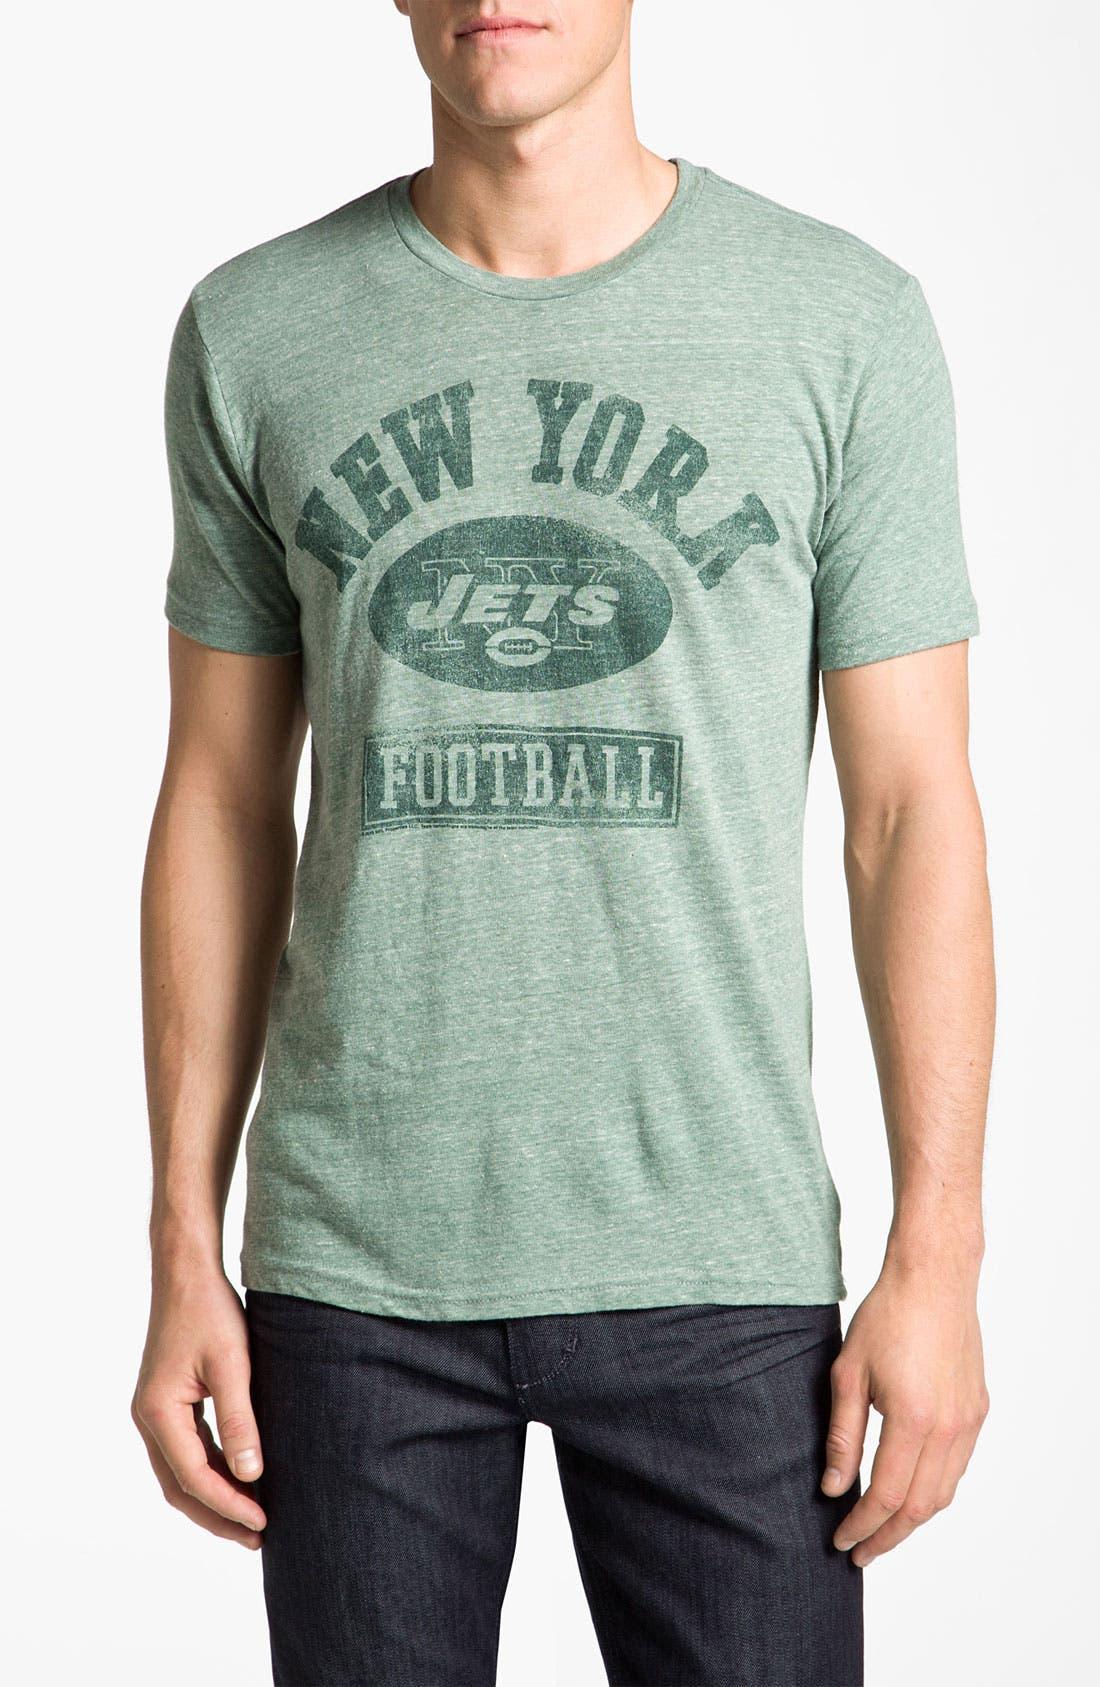 Main Image - Junk Food 'New York Jets' T-Shirt